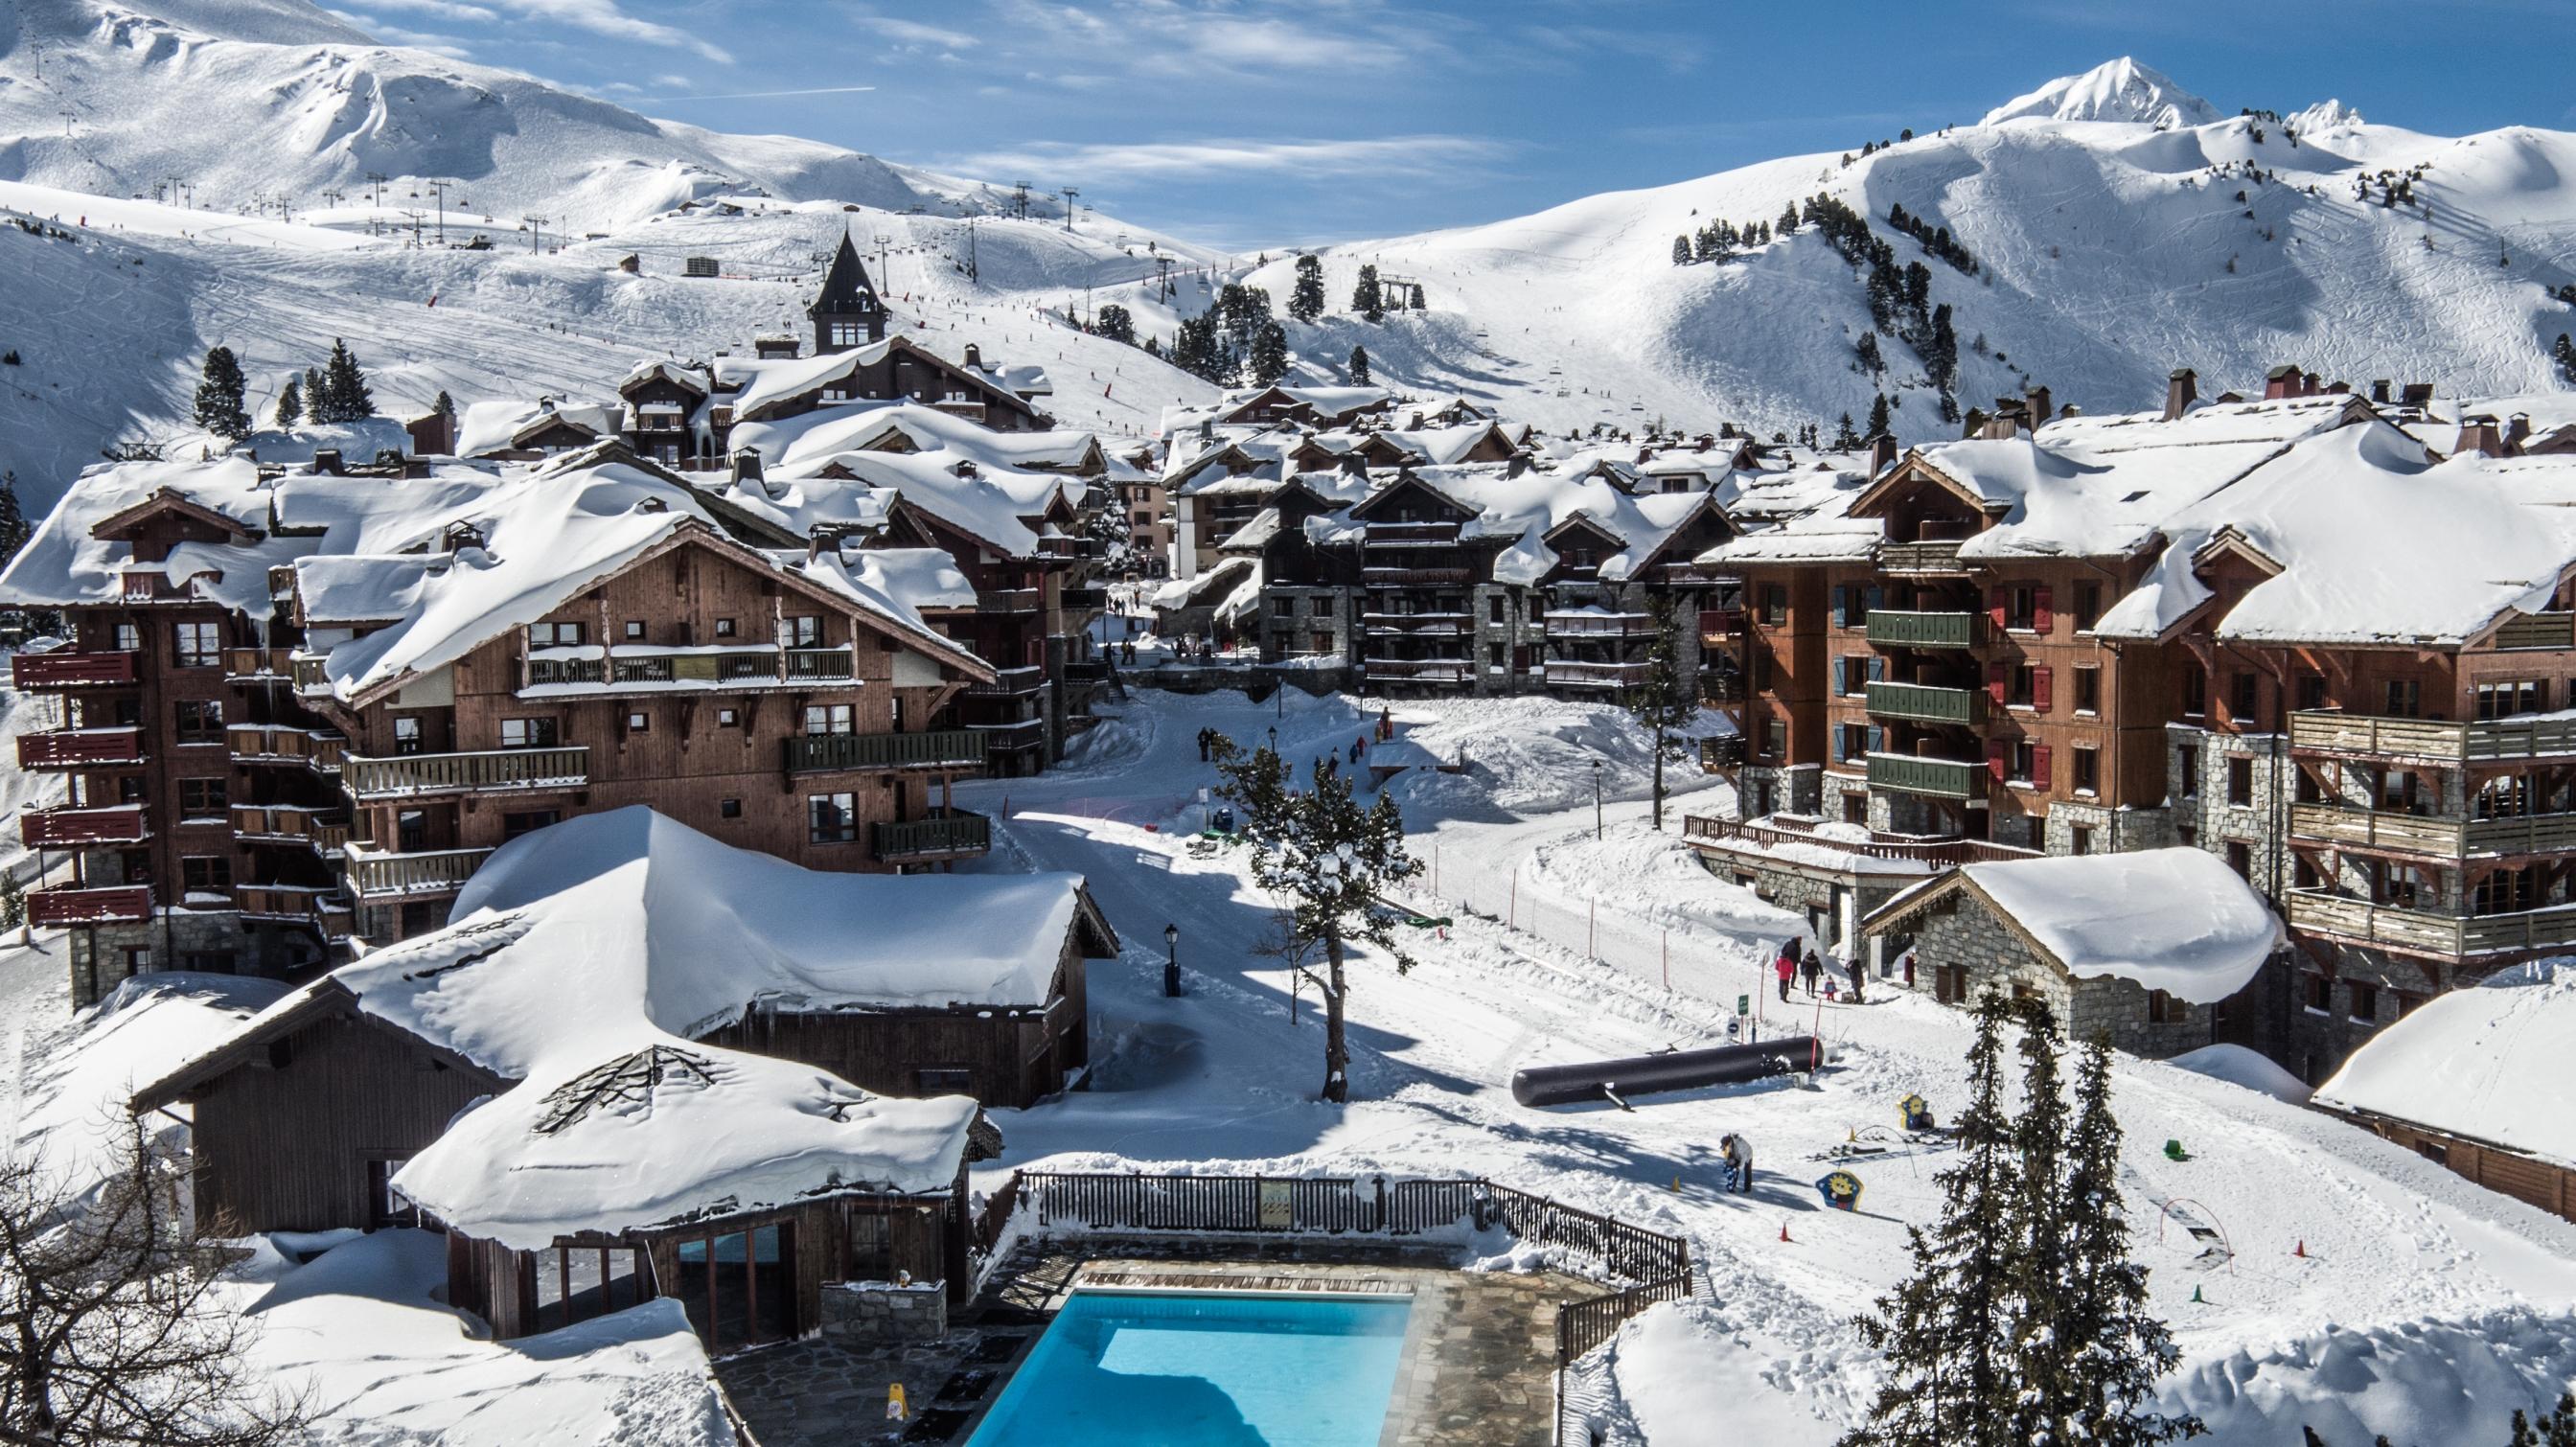 Les Arcs 1950 ski resort France